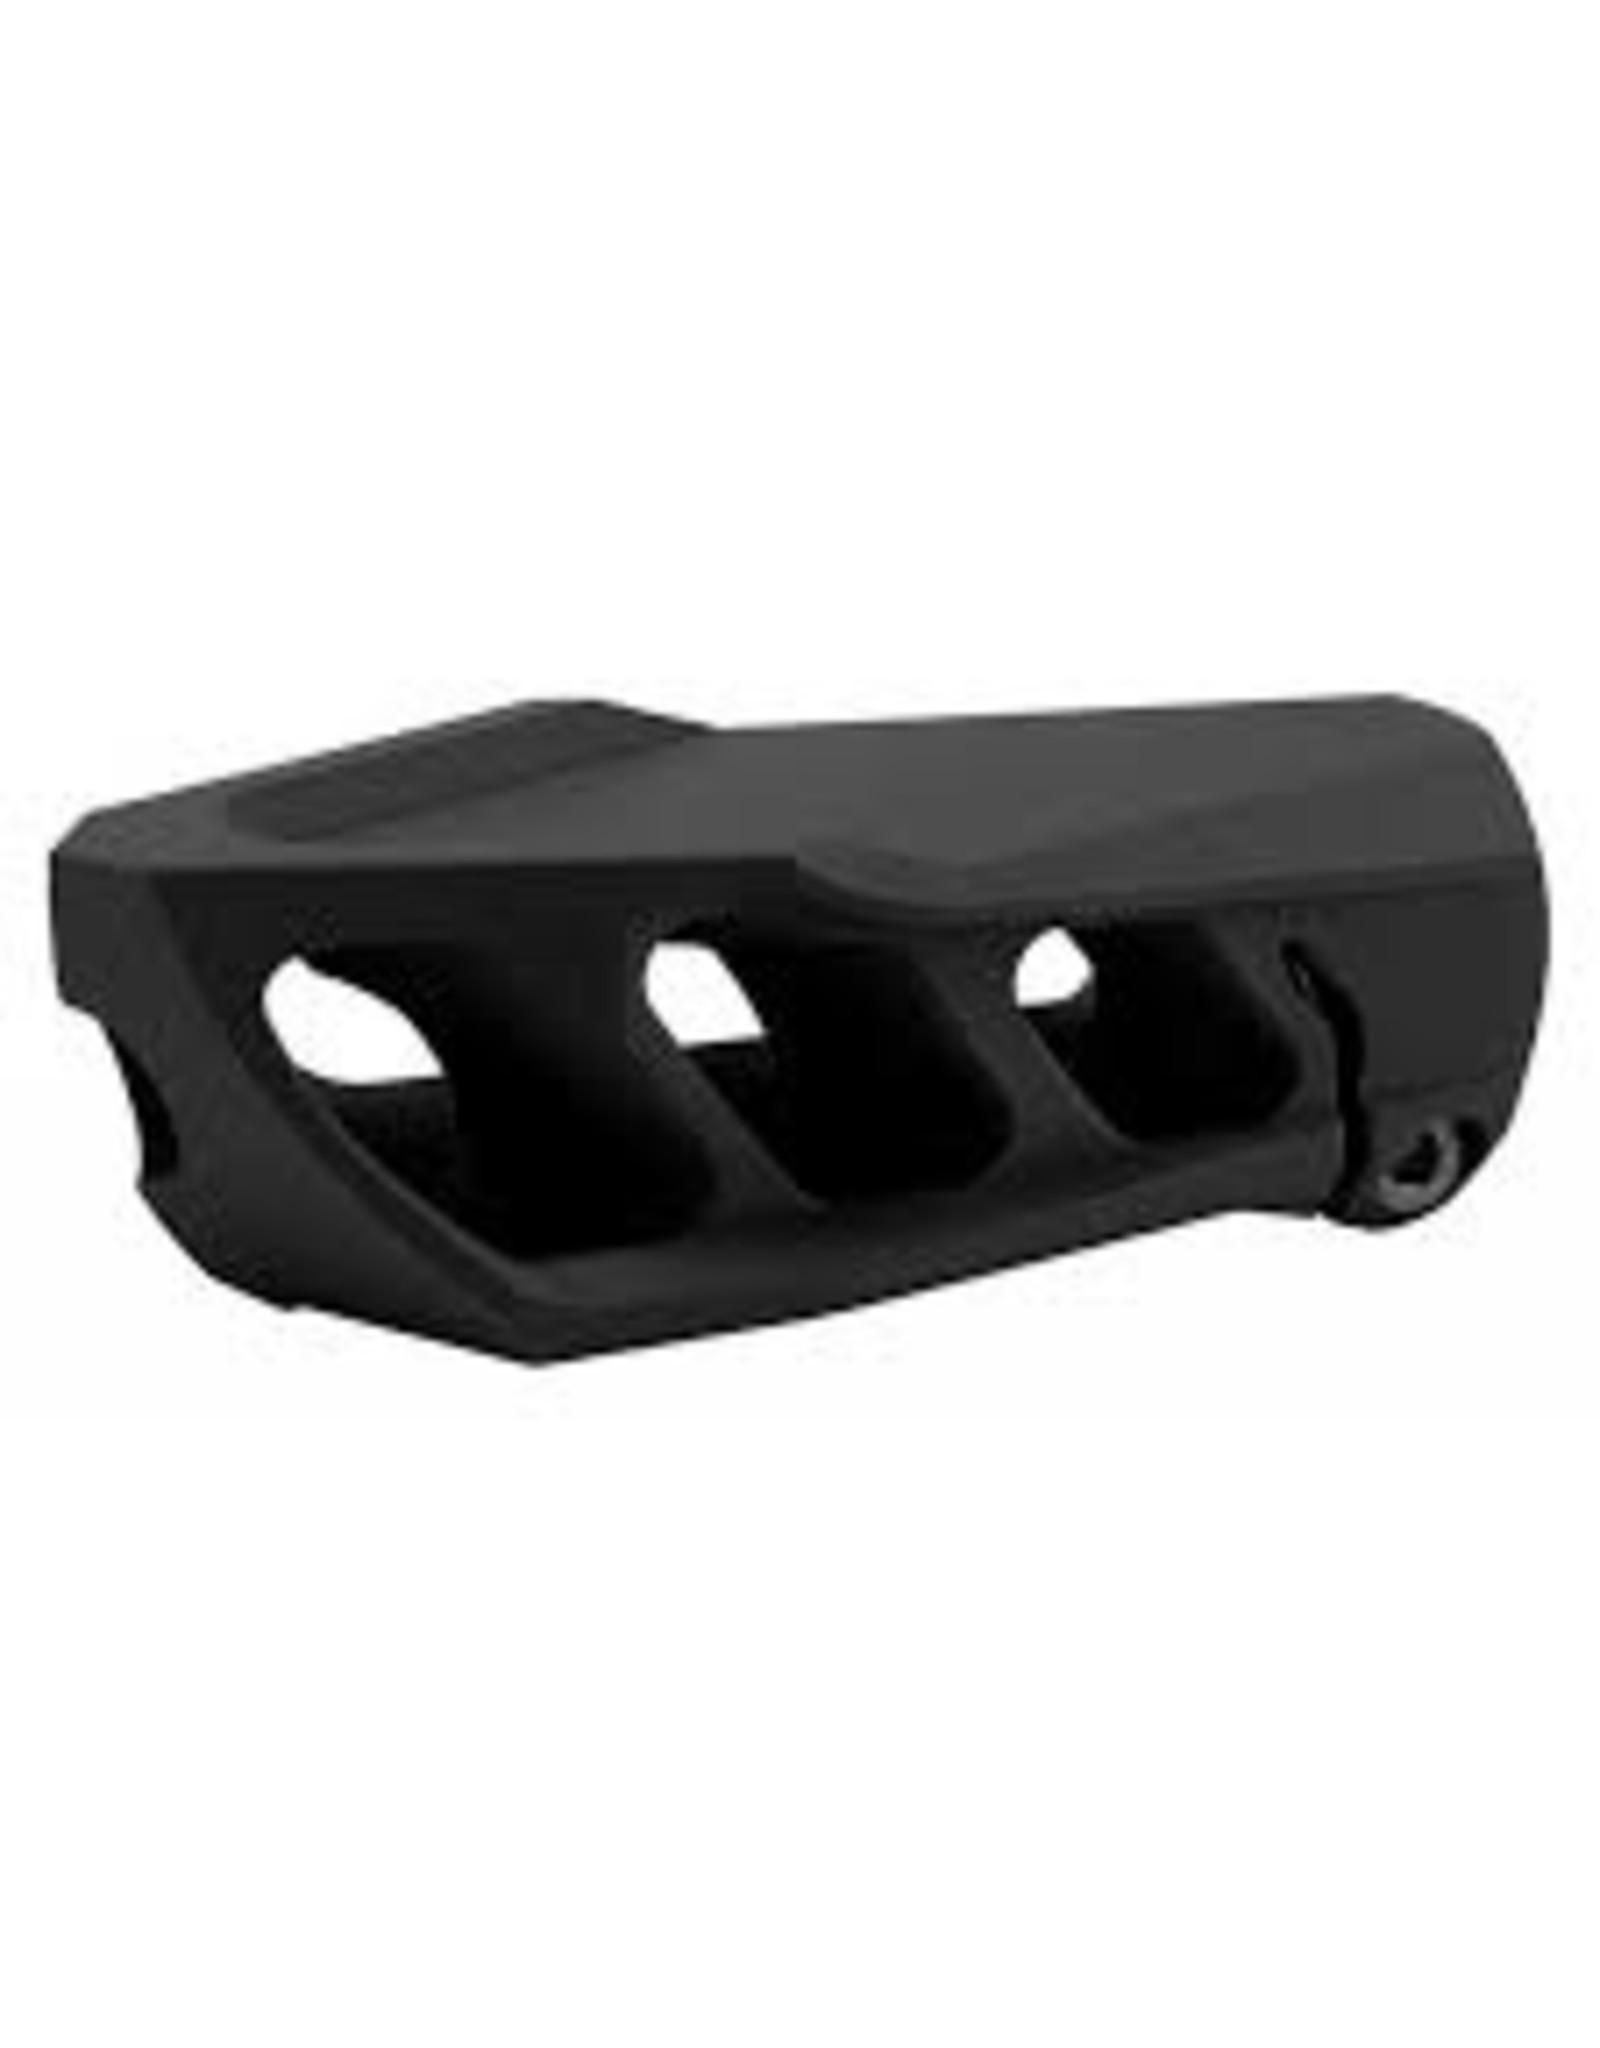 Cadex Cadex MX1 Muzzle Brake 5/8-24 Threads Black